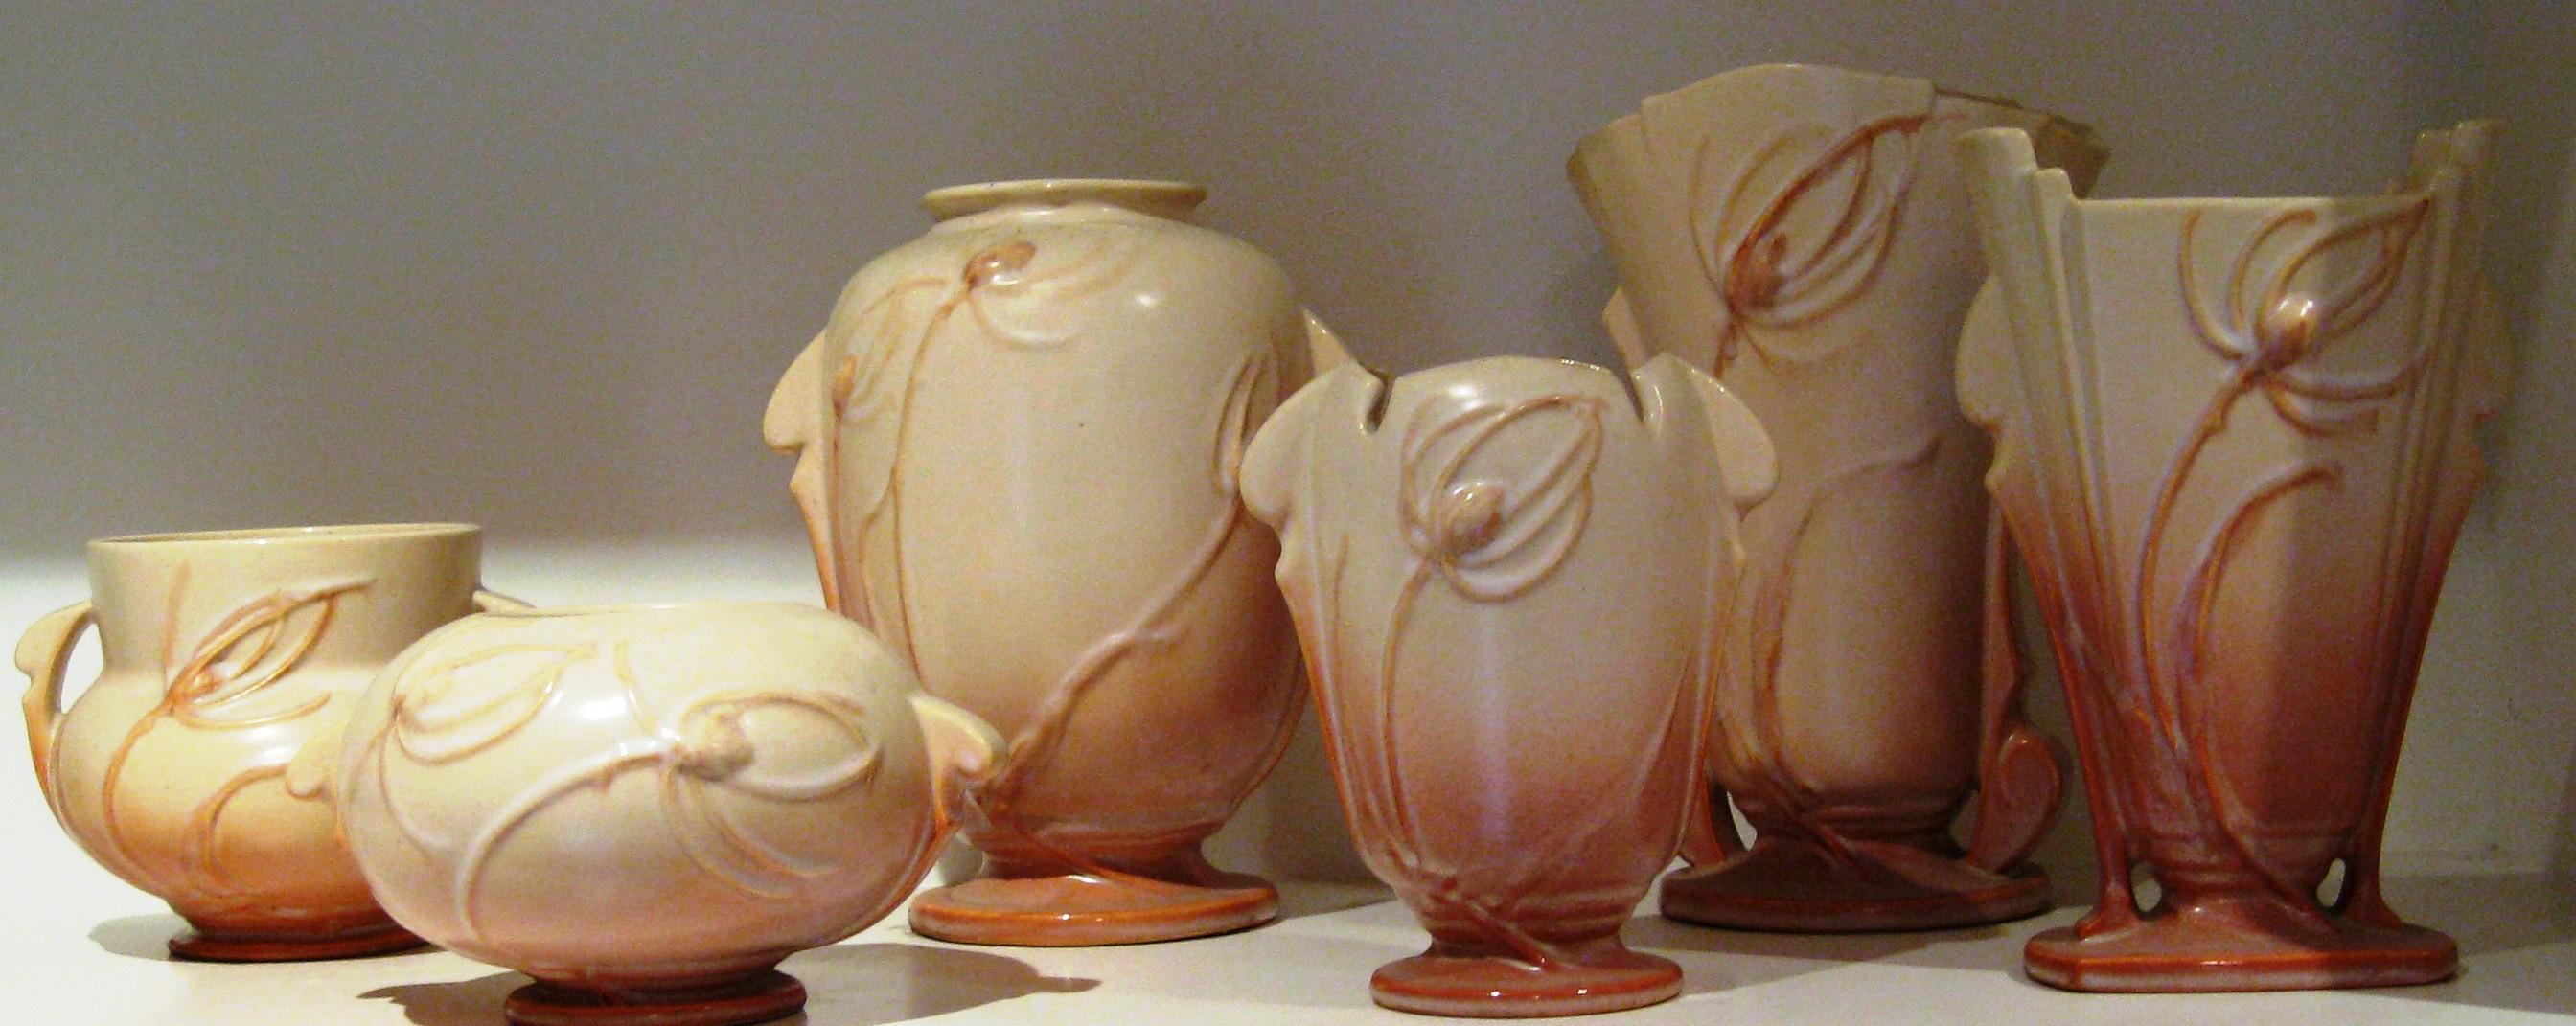 sascha brastoff vase of sascha brastoff billy blue eye pottery paintings regarding roseville pottery